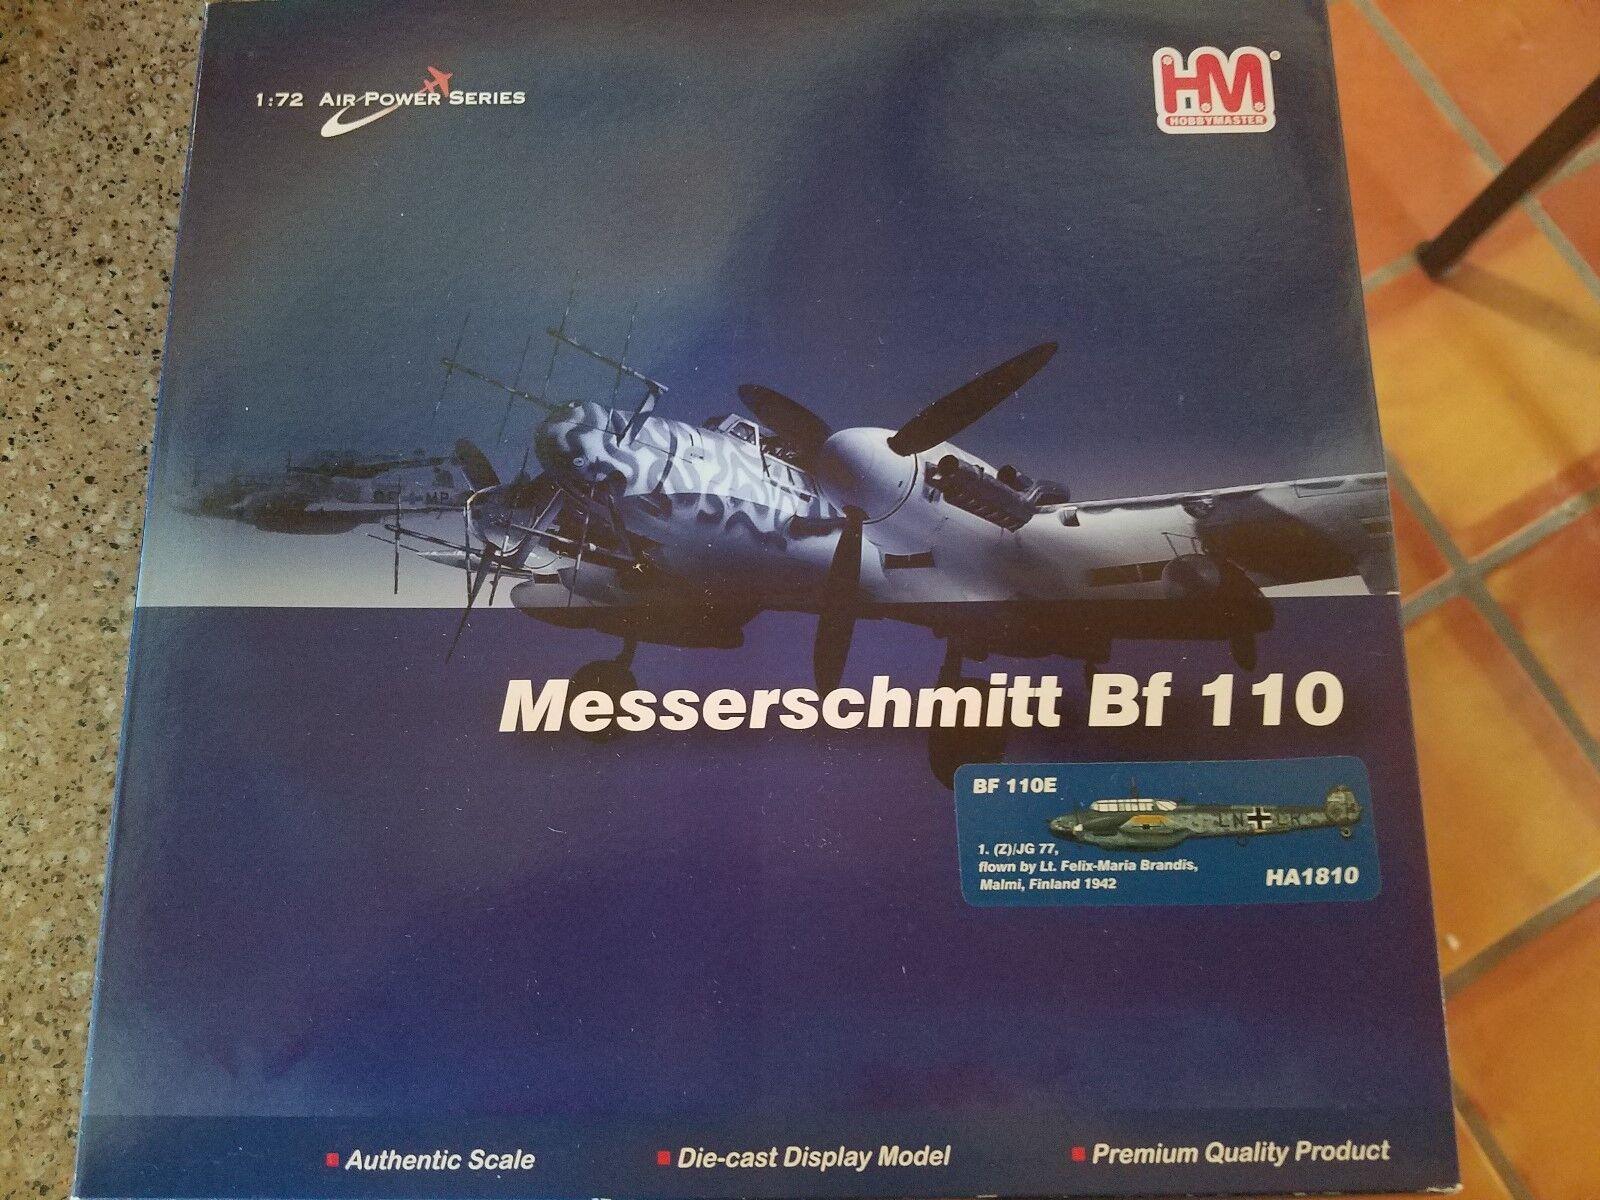 Hobby Master 1/72 aire potencia serie HA1810 Bf 110E 1. (Z)/JG 77 Lt. Felix-Maria